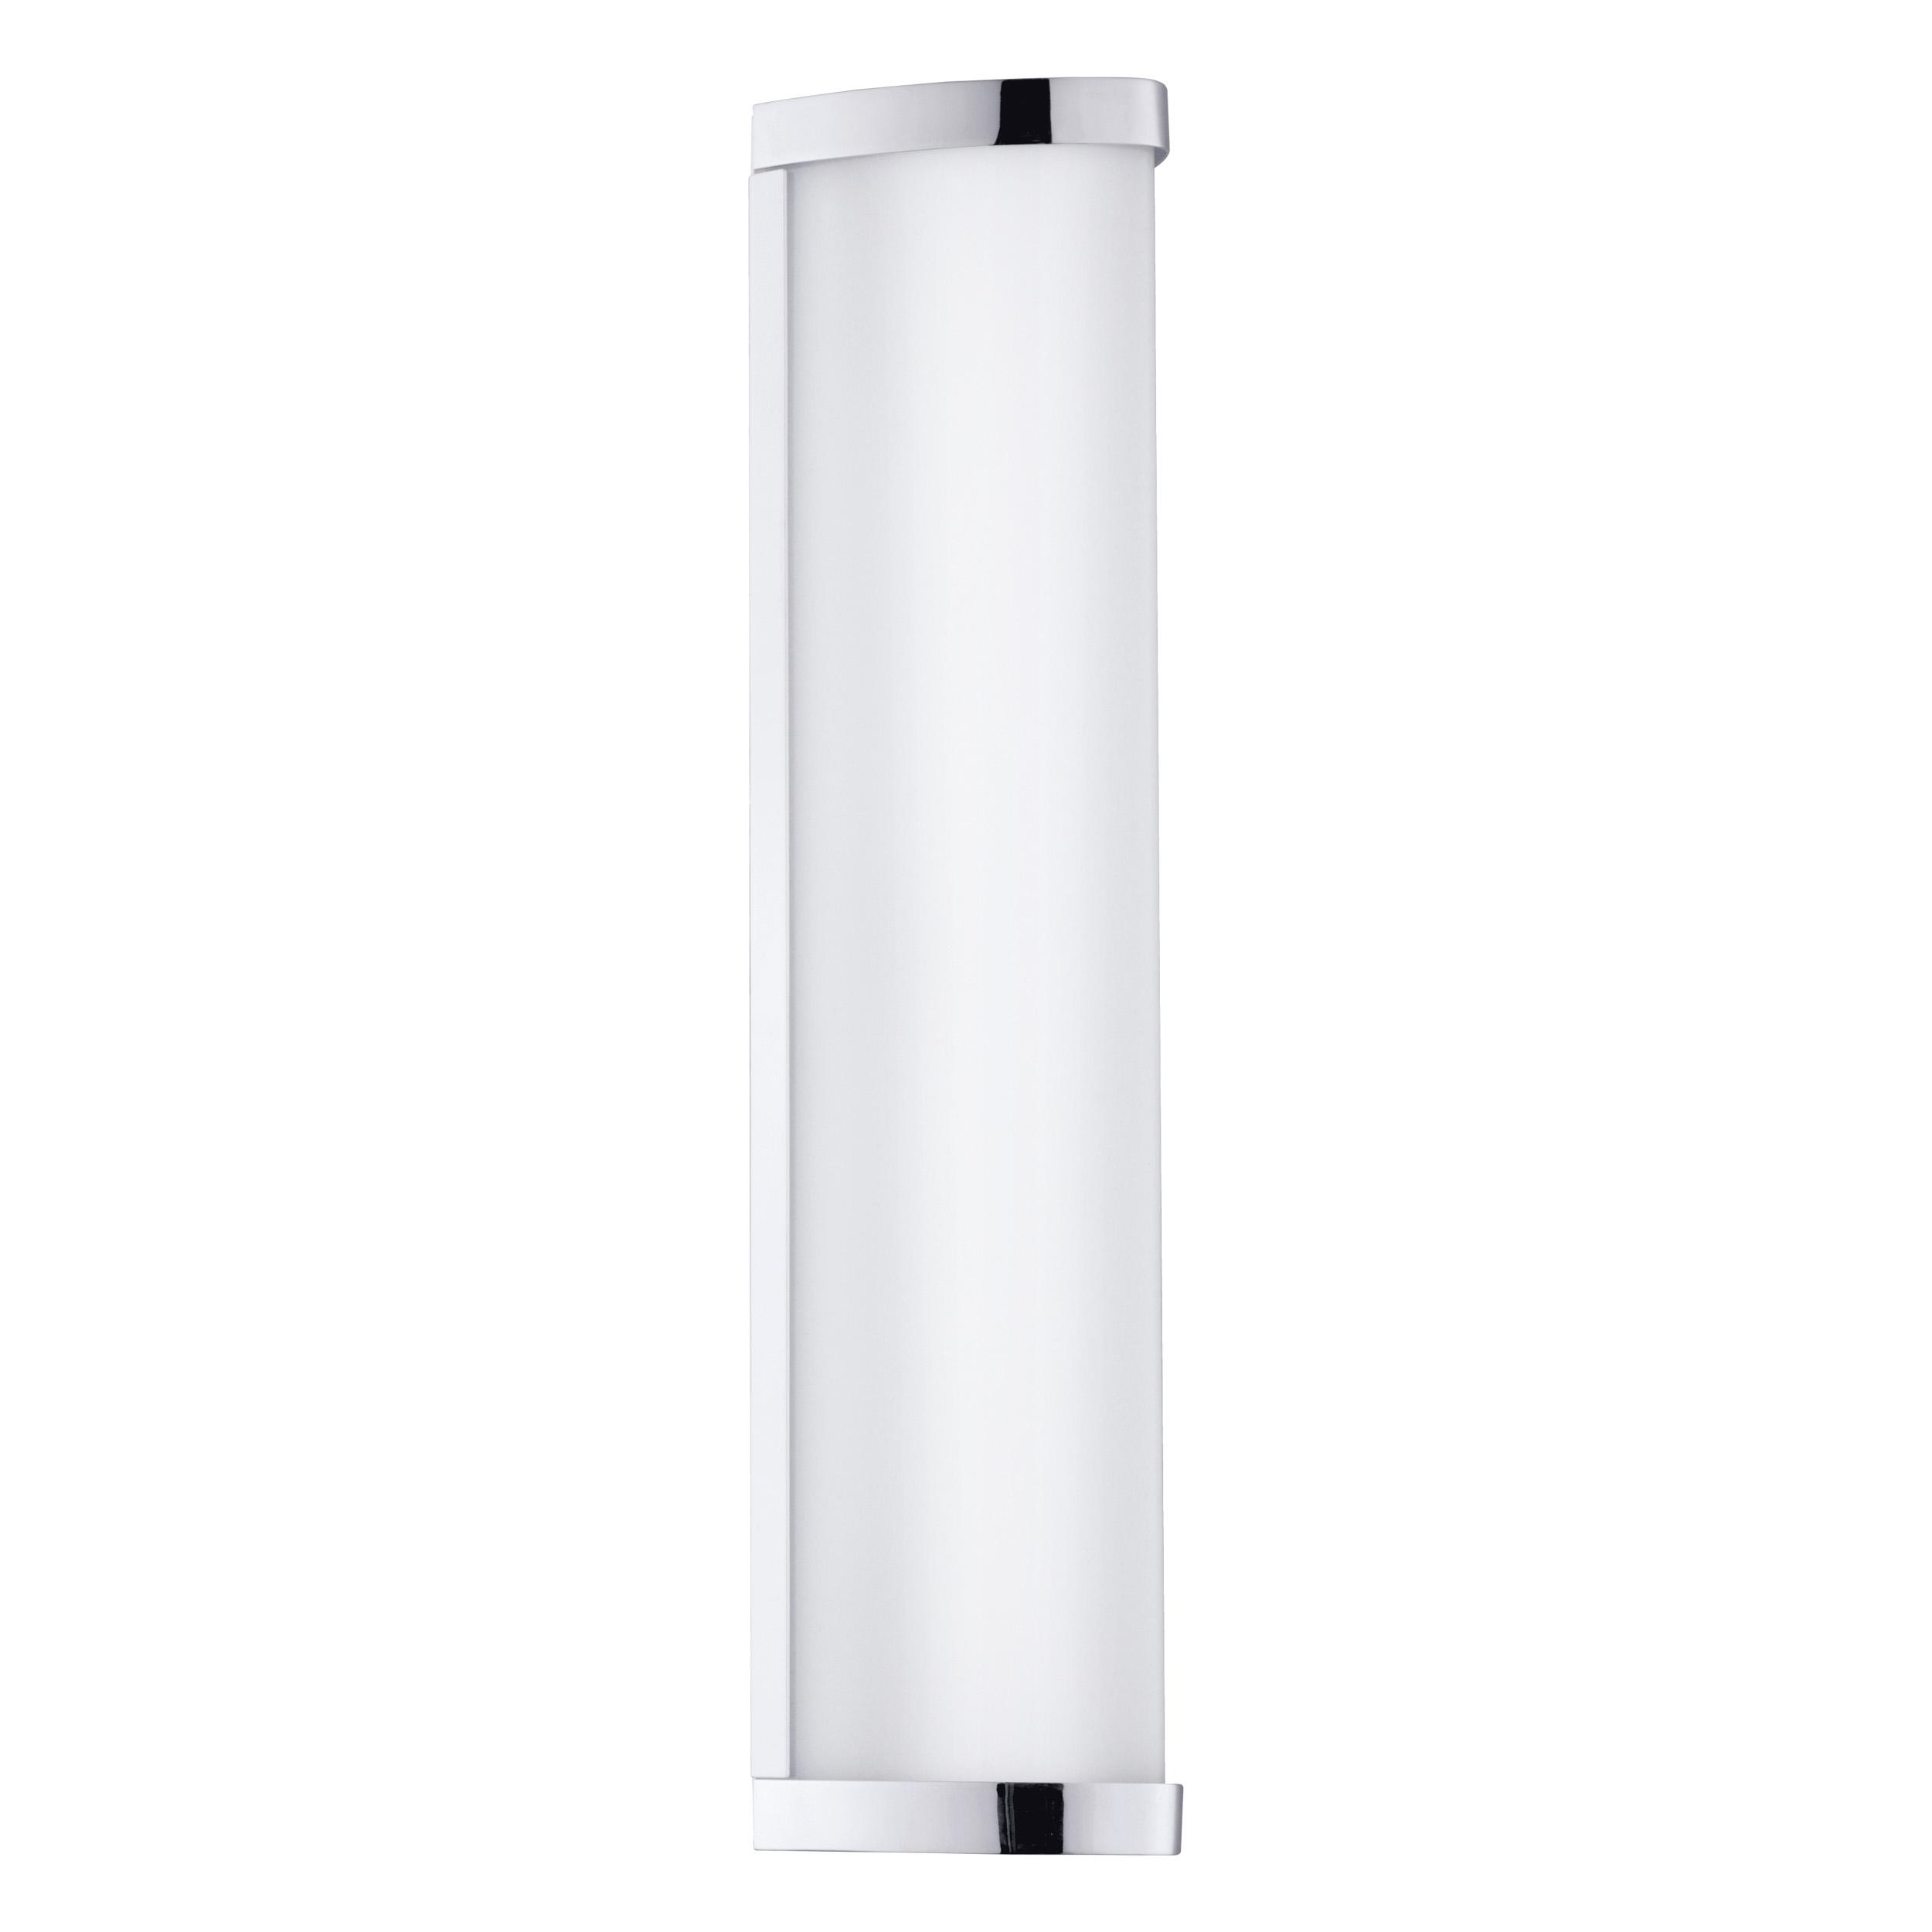 1 Stk LED-Wandleuchte Gita 2 Pro 16W 4000K chrom/weiss IP20 LI64045---